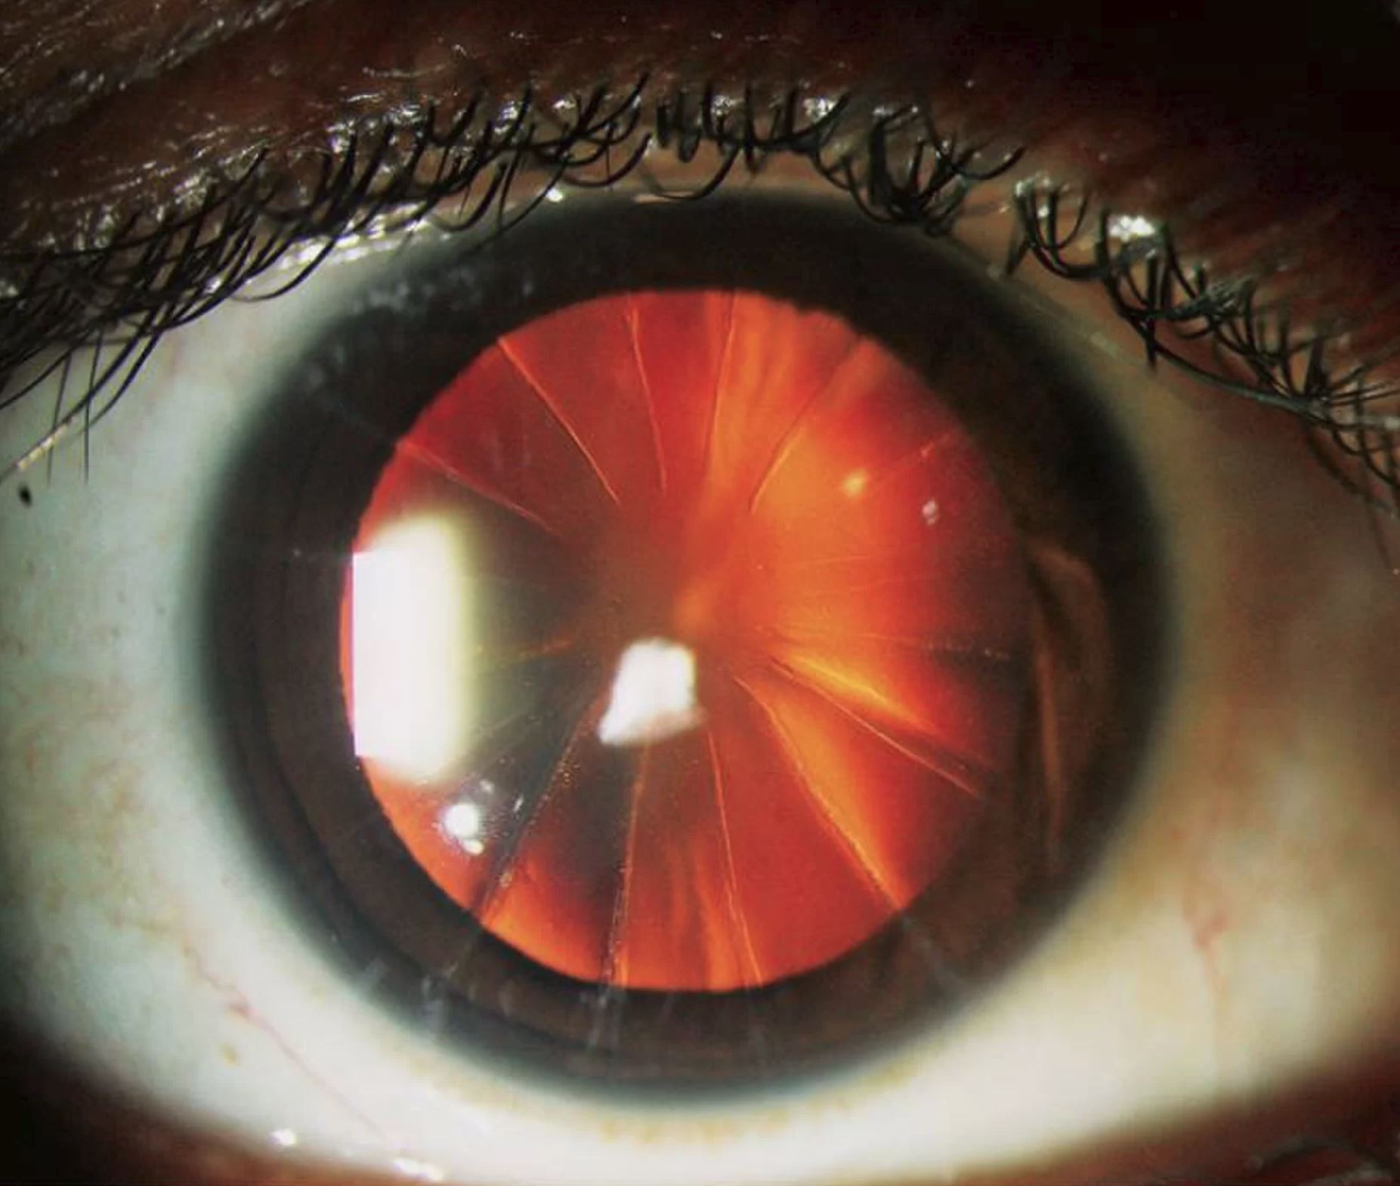 Oko, operacja oka, oko jak pizza, promieniowa keratotomia